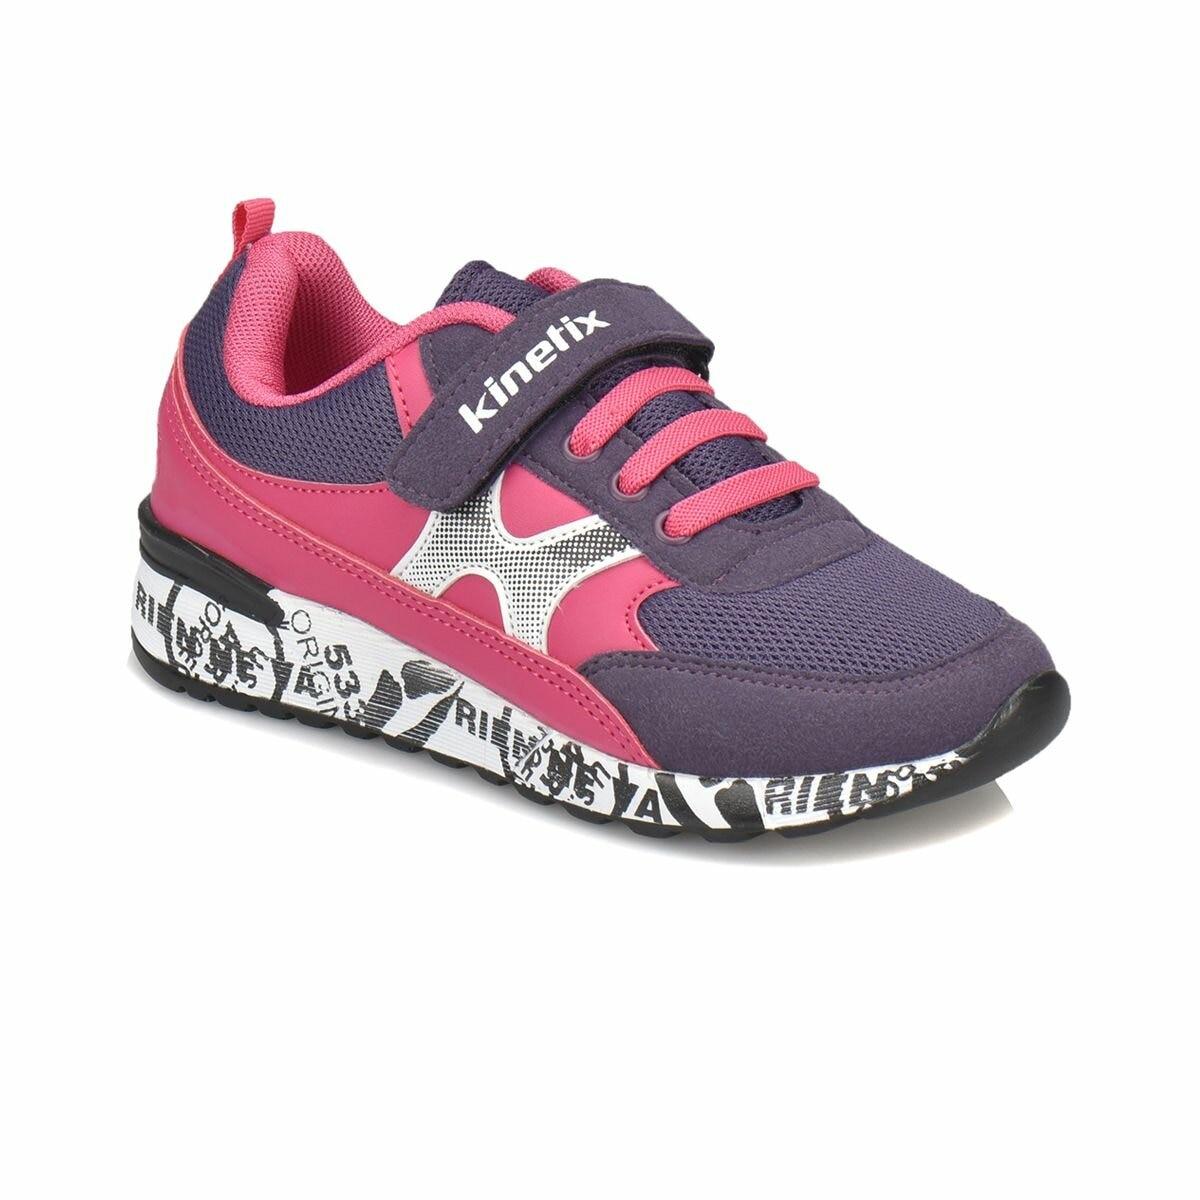 FLO NEVA Purple Male Child Sneaker Shoes KINETIX